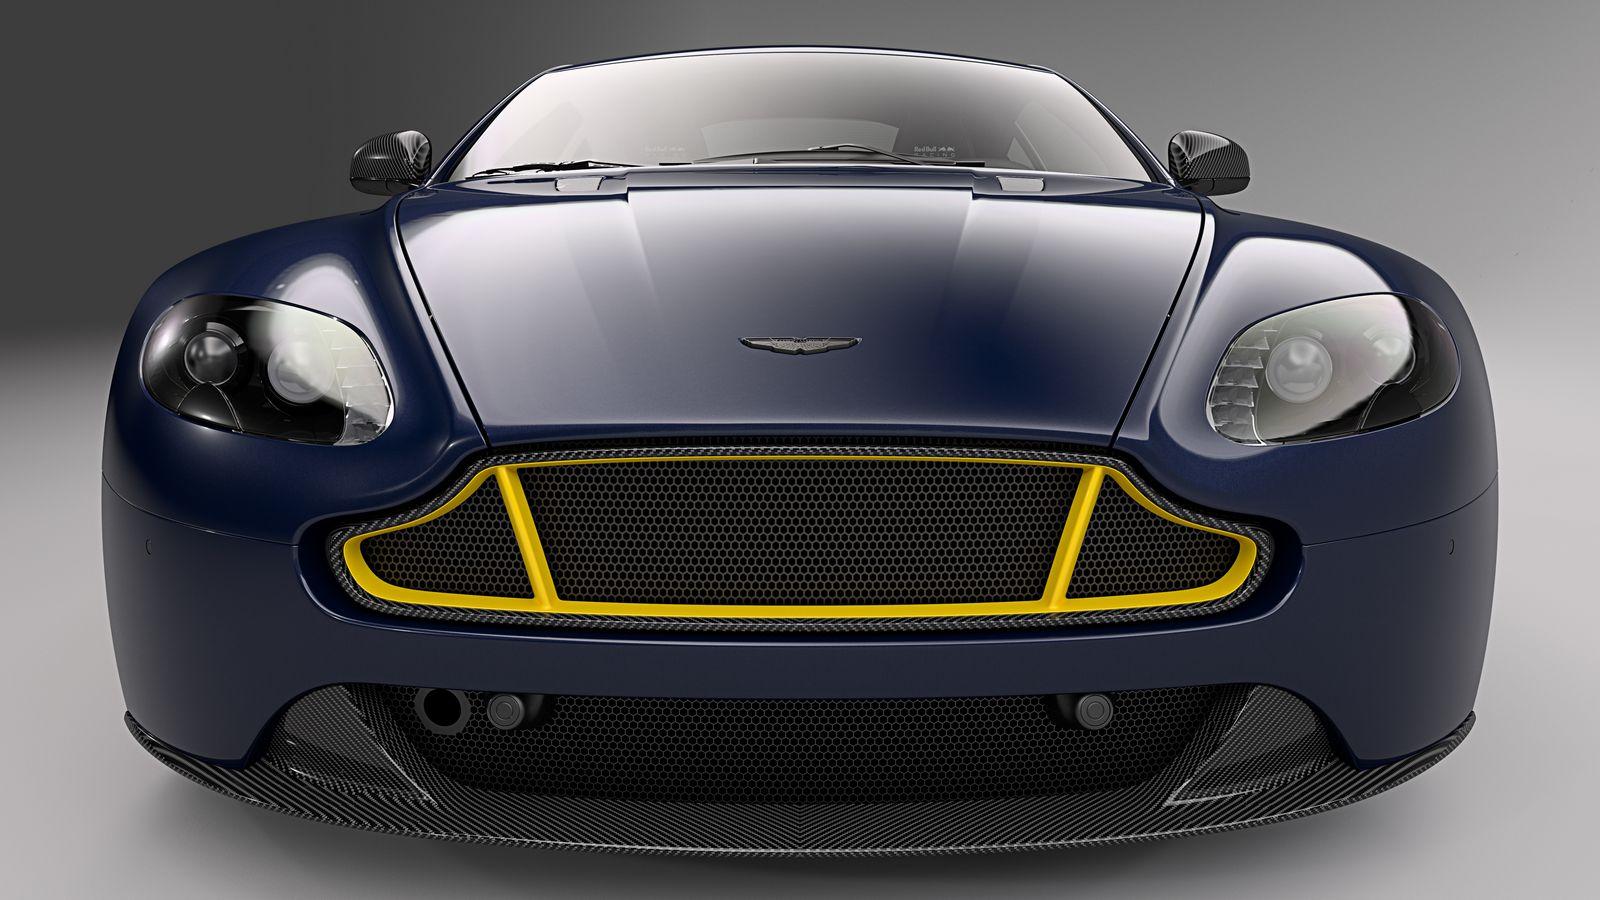 Aston Martin V8 and V12 Vantage Red Bull Racing Editions (10)